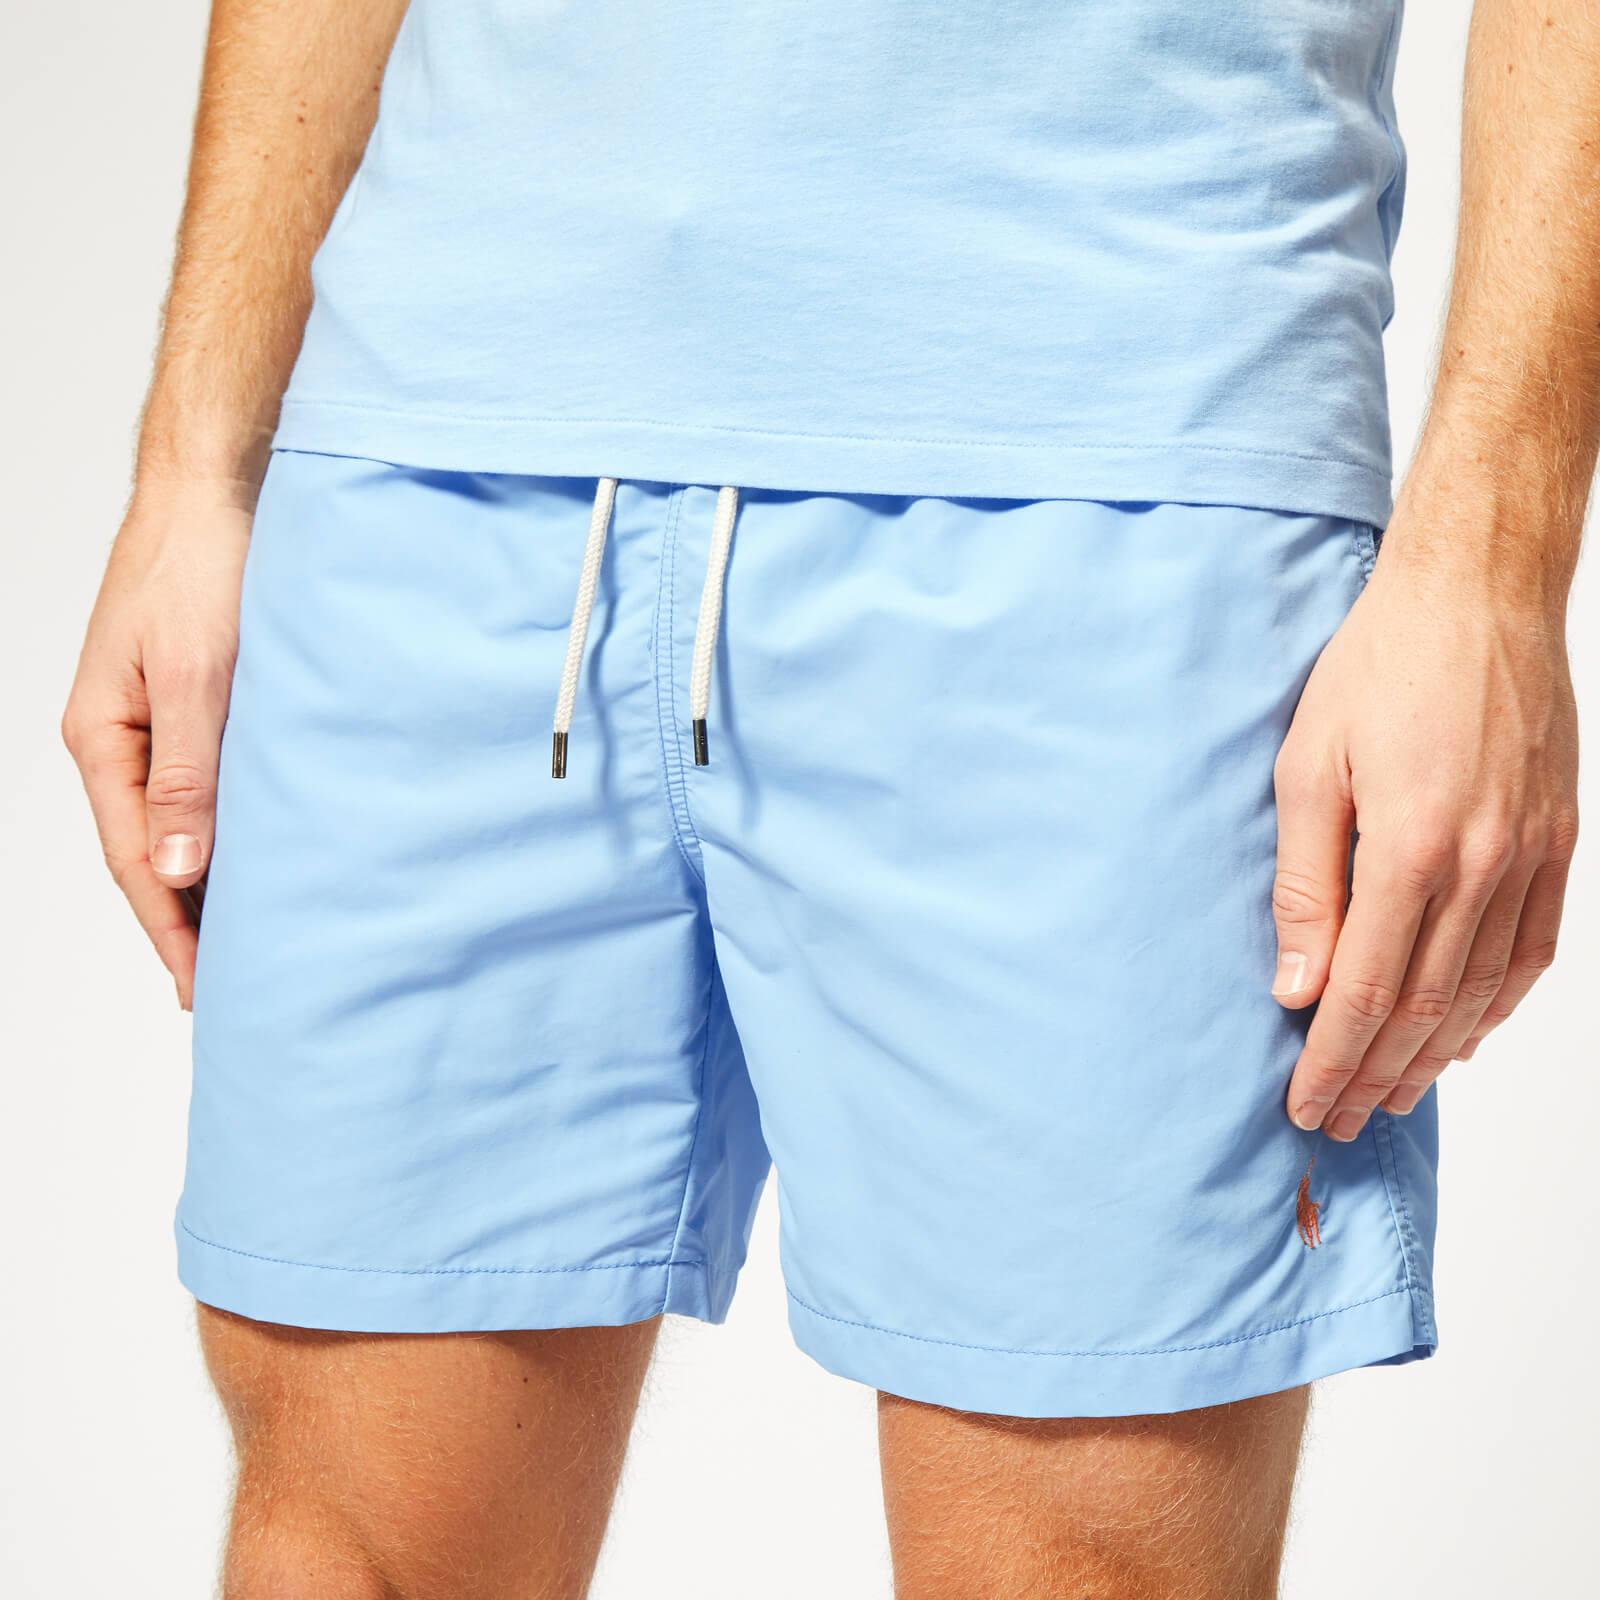 1f9446f9558d2 Polo Ralph Lauren Men's Traveller Swim Shorts - Baby Blue - Free UK  Delivery over £50